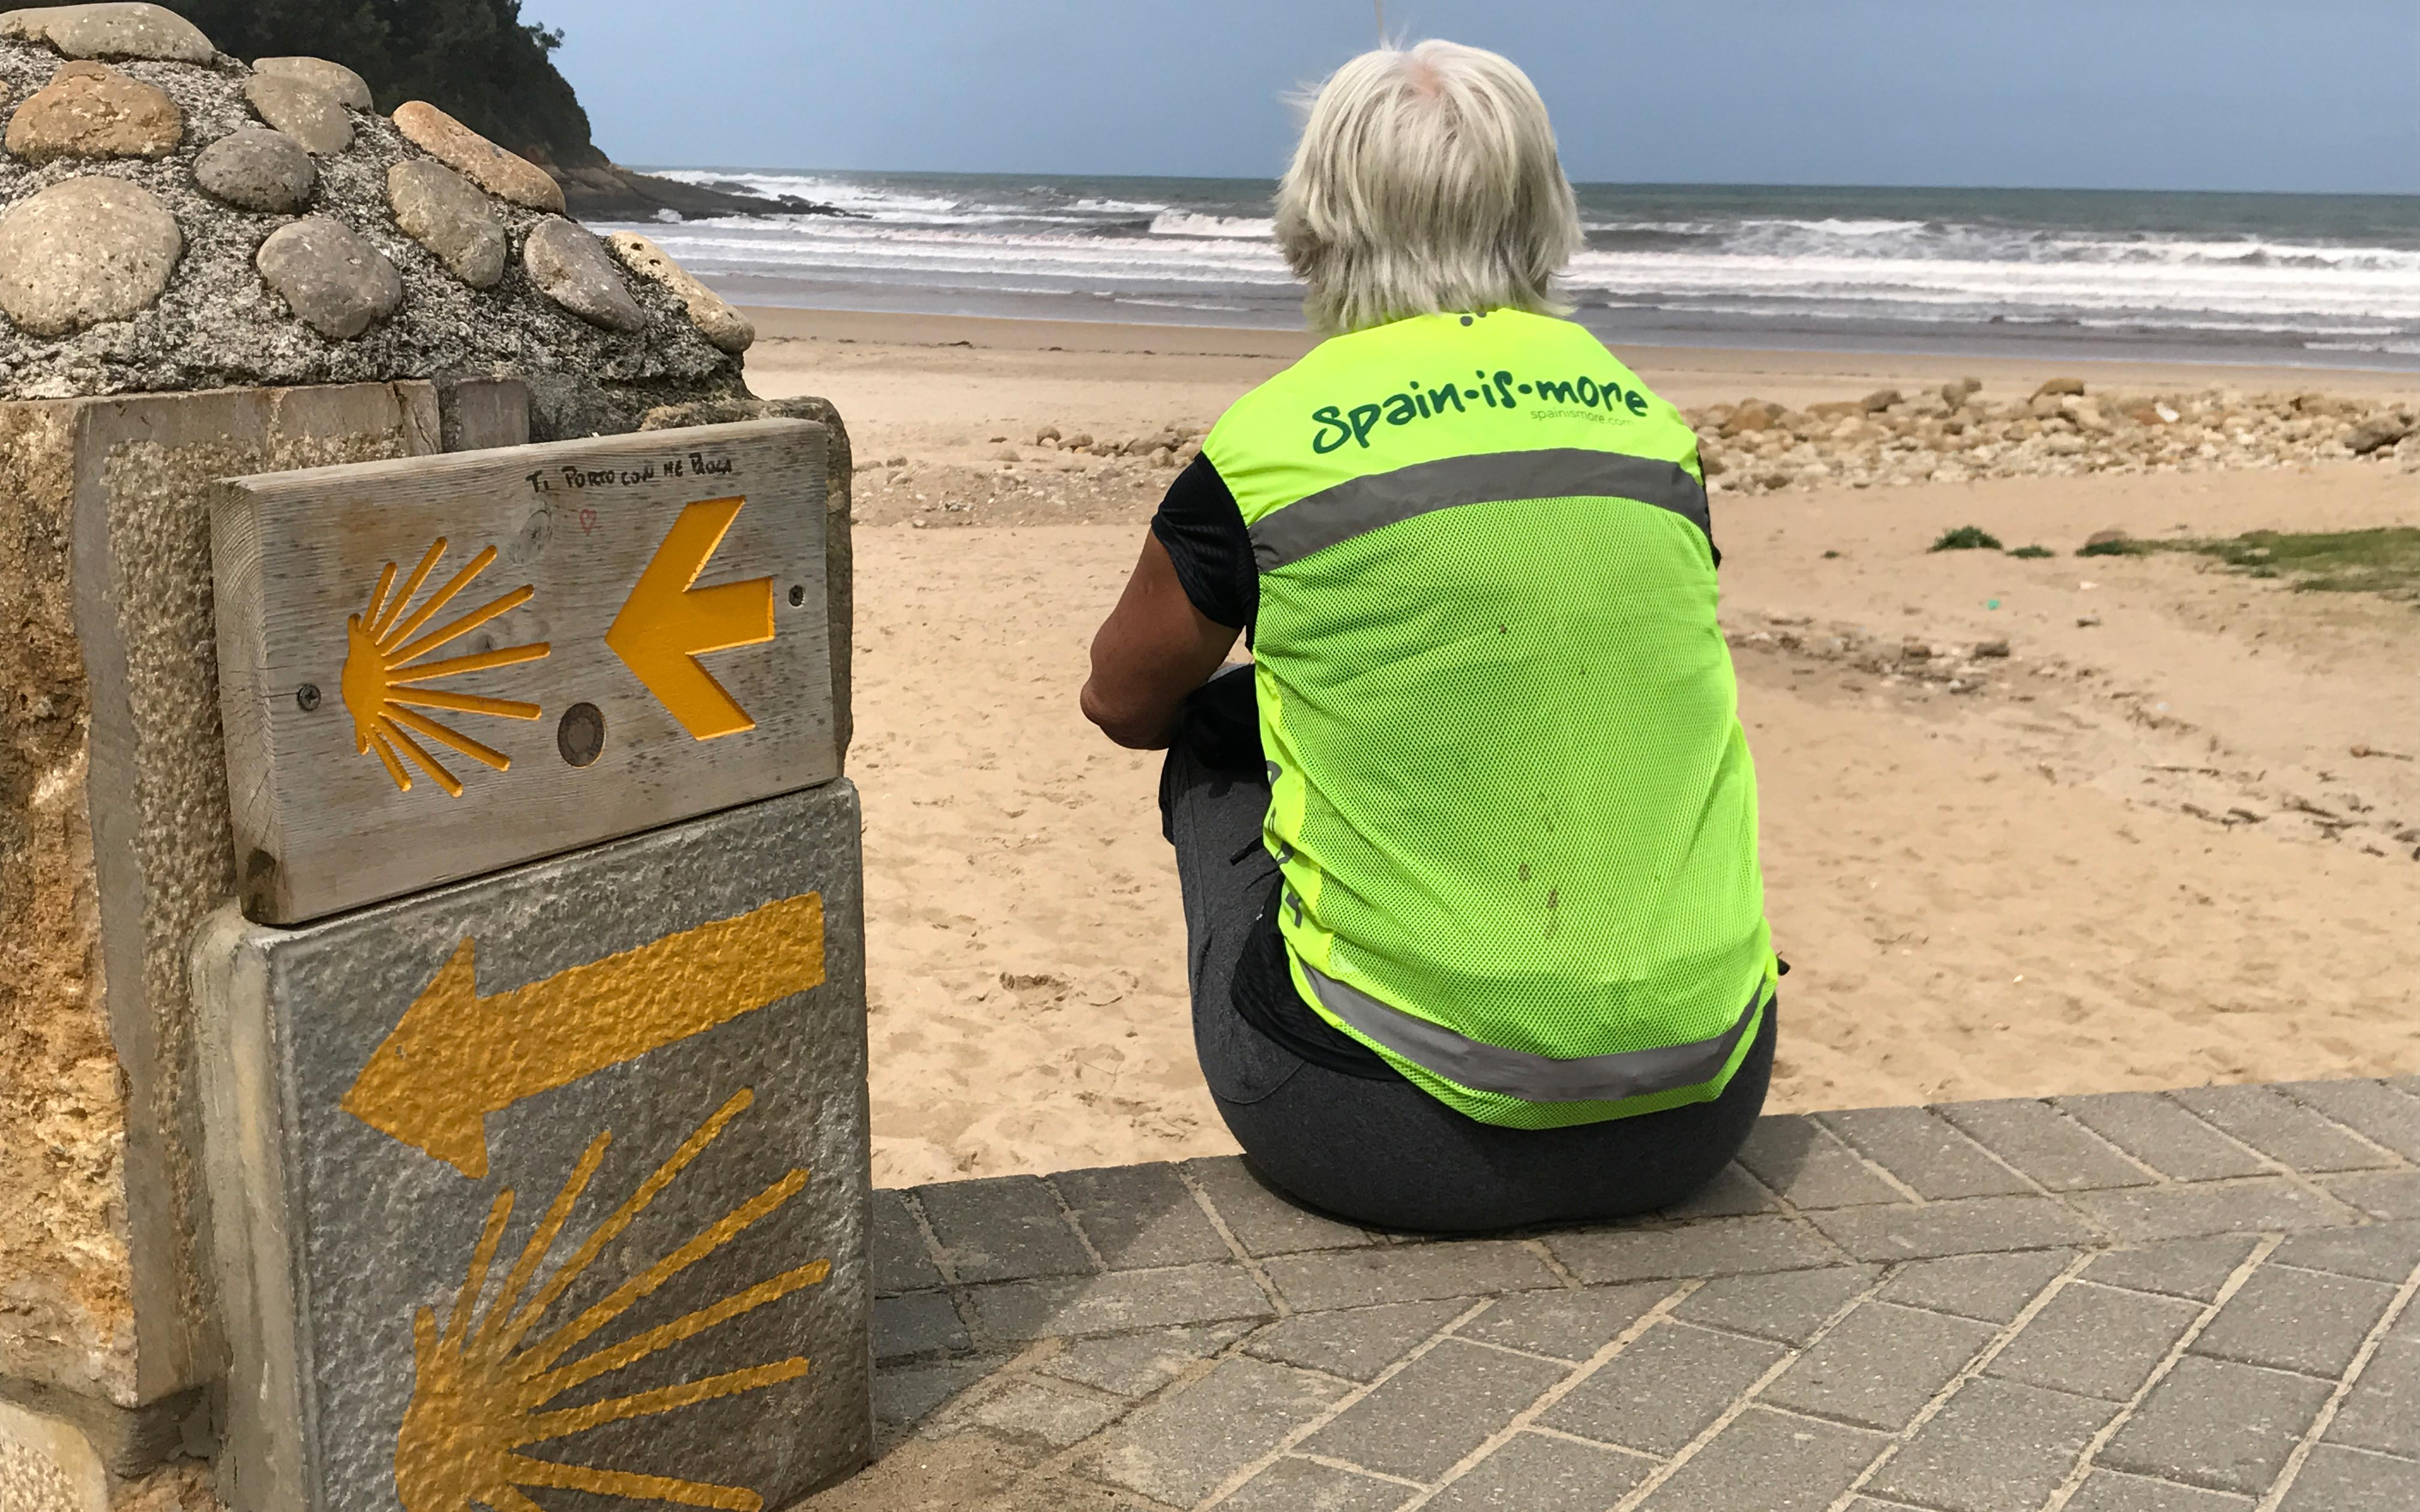 La Concha i San Sebastián - Europas bästa strand - Nyheter Norra ... 3e7fd936cc9